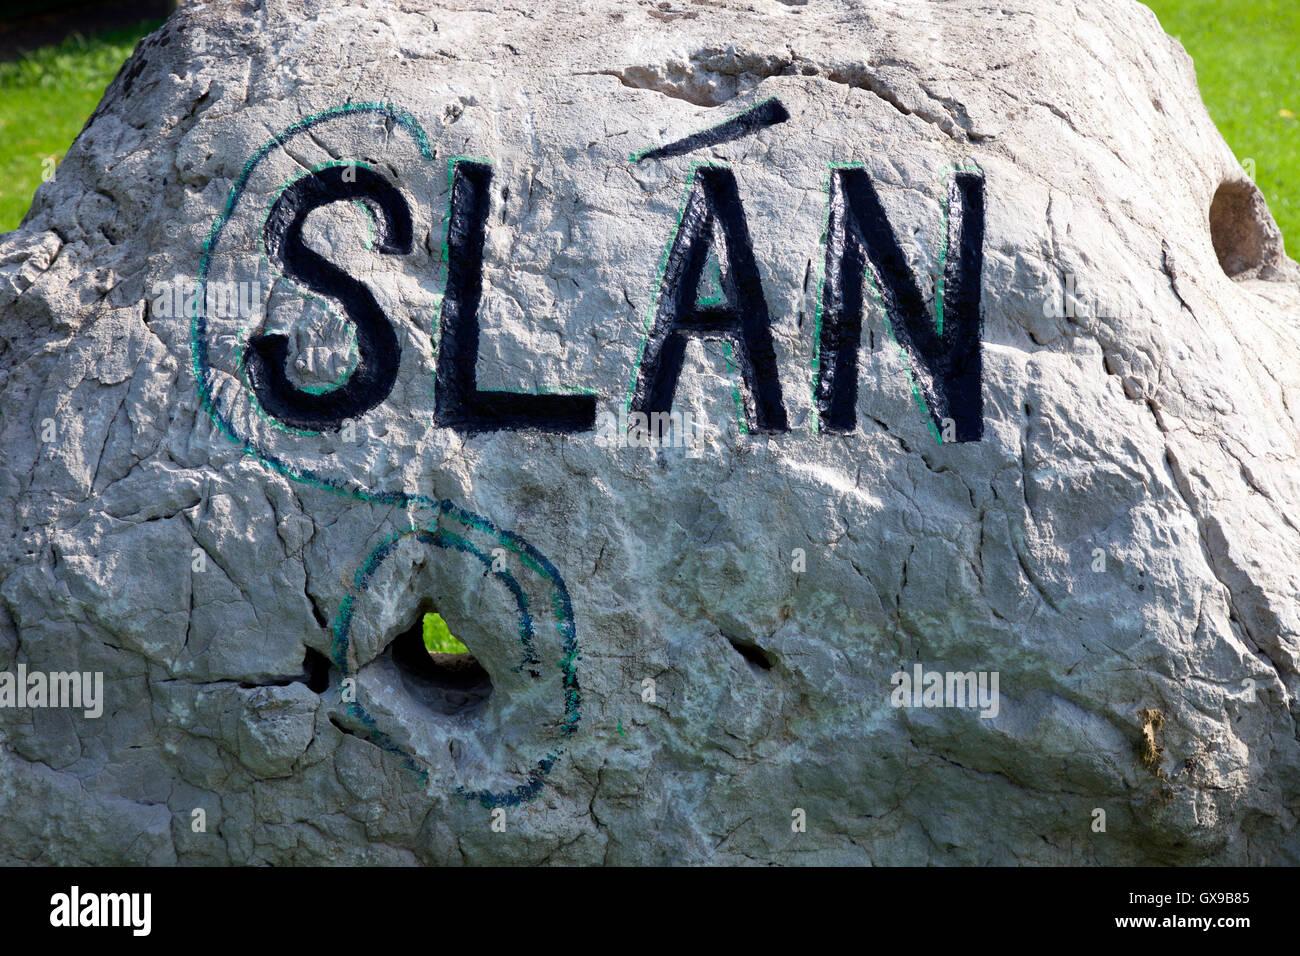 Slan - Adiós en irlandés, firmar en las afueras de Carrickmacross, Condado de Monaghan Imagen De Stock